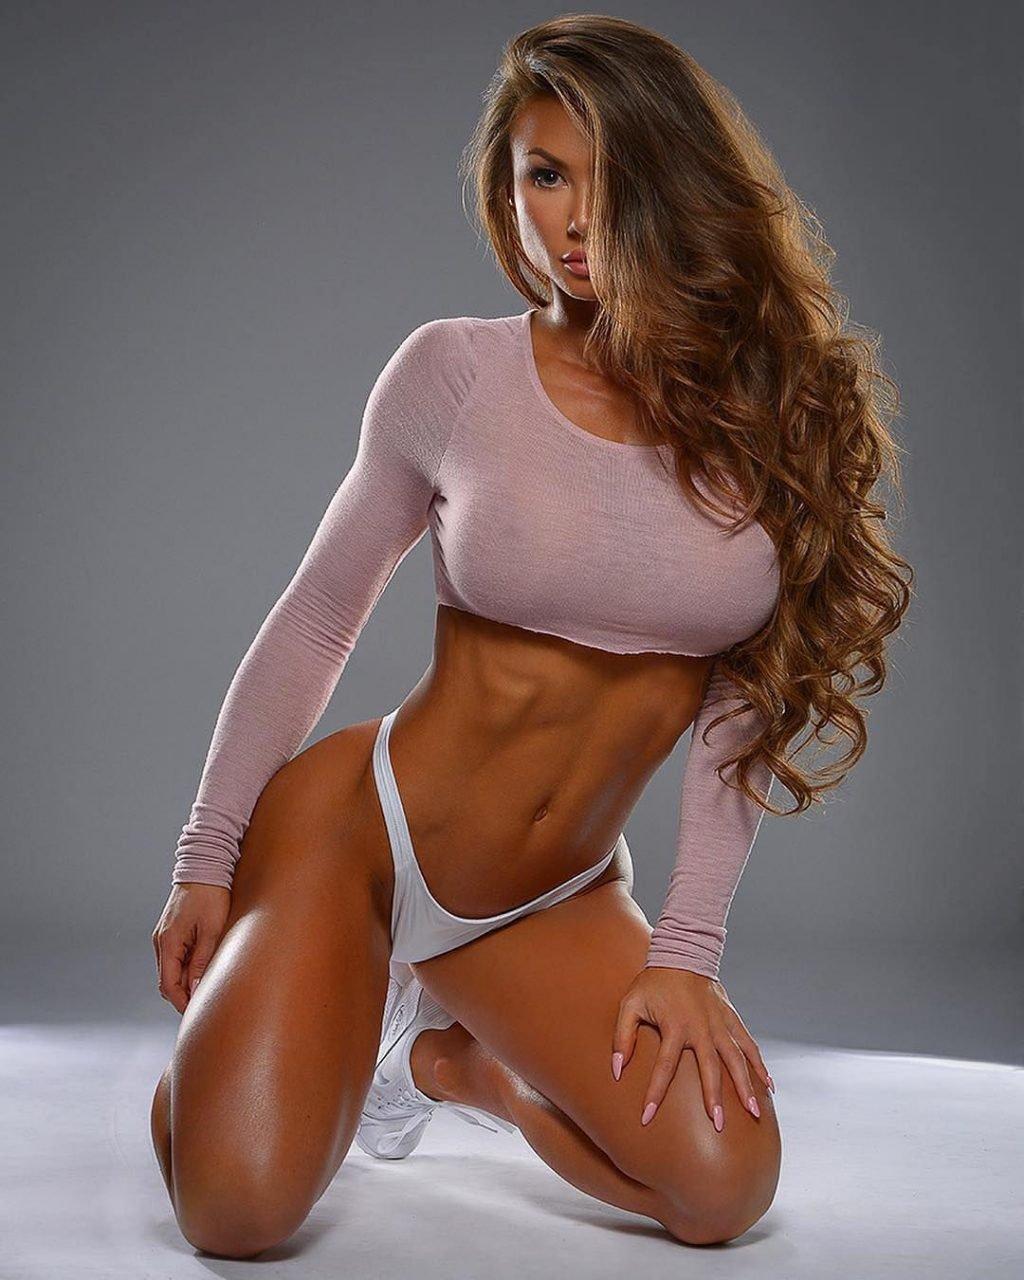 Michie Peachie Sexy nudes (25 pictures)